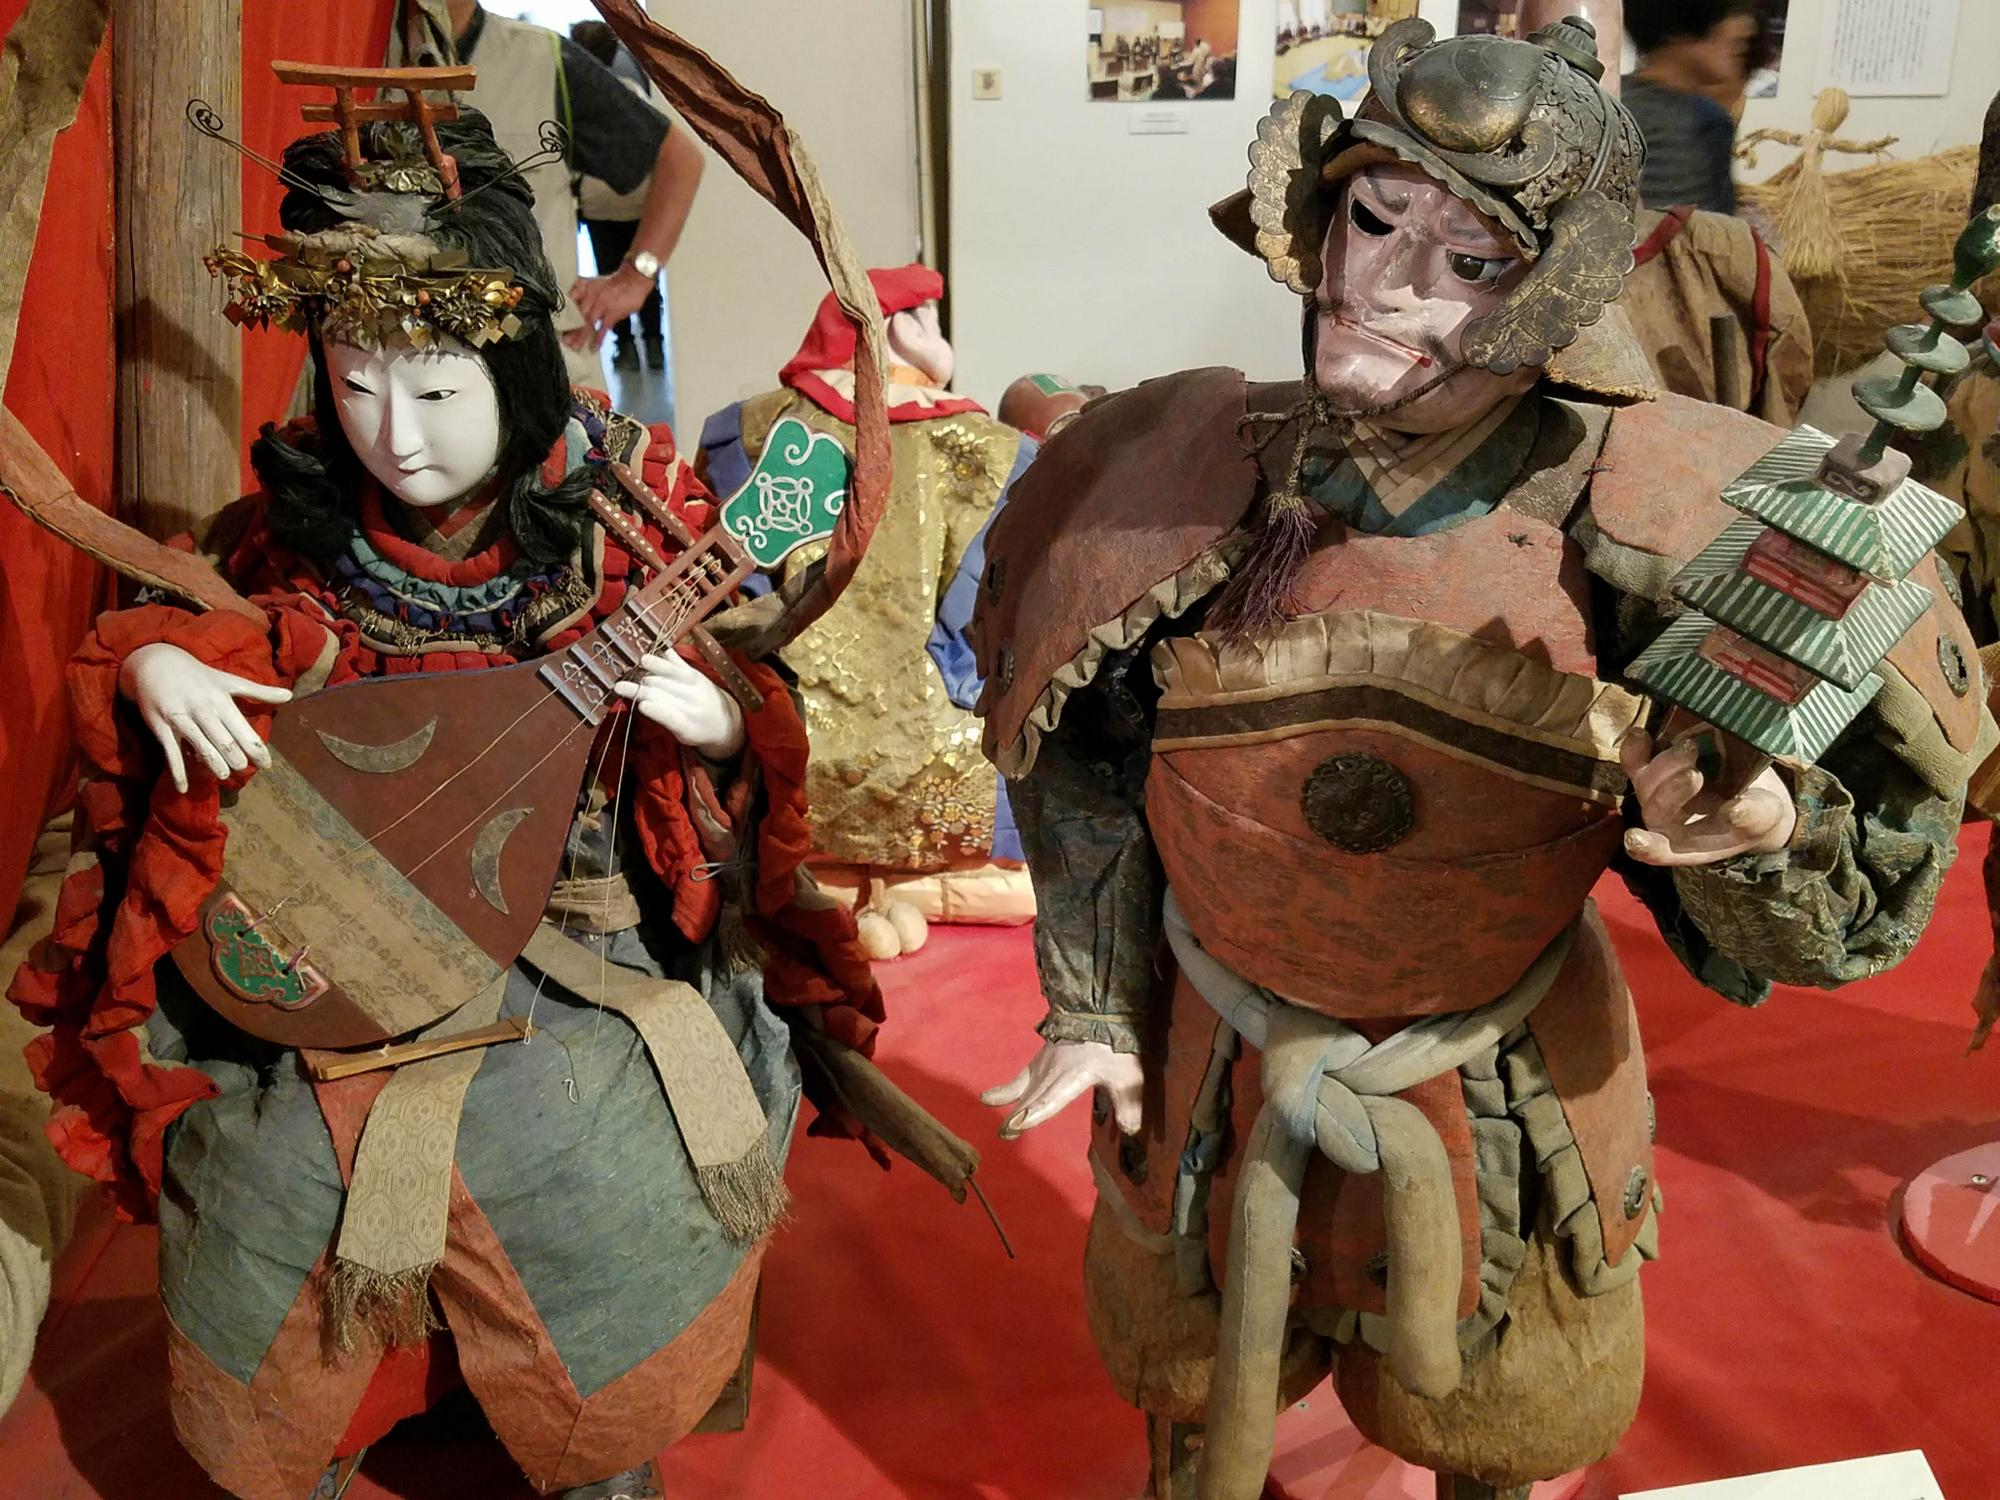 Deity figurines at the Matsumoto City Museum